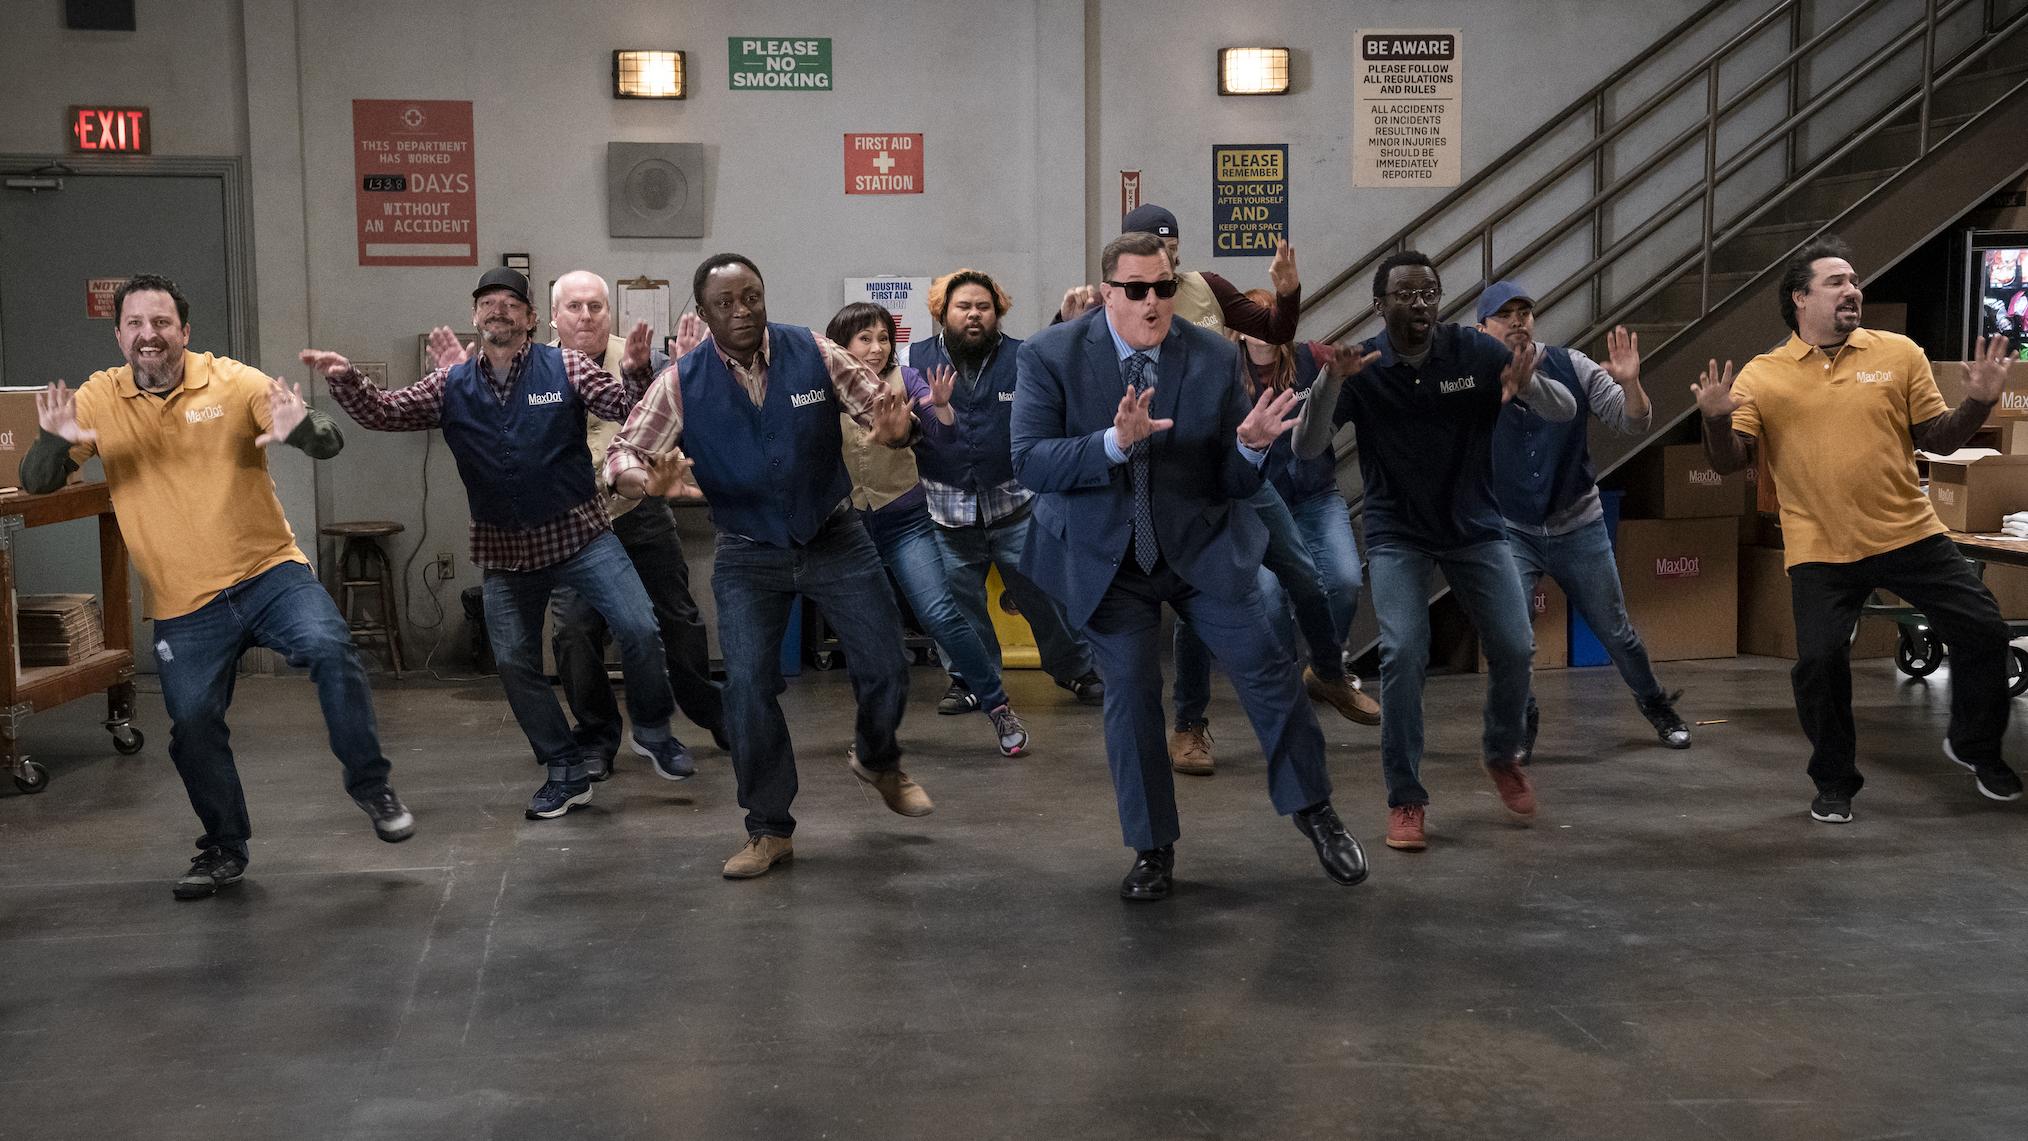 Bob Hearts Abishola Season 2 Episode 9 Dancing Billy Gardell